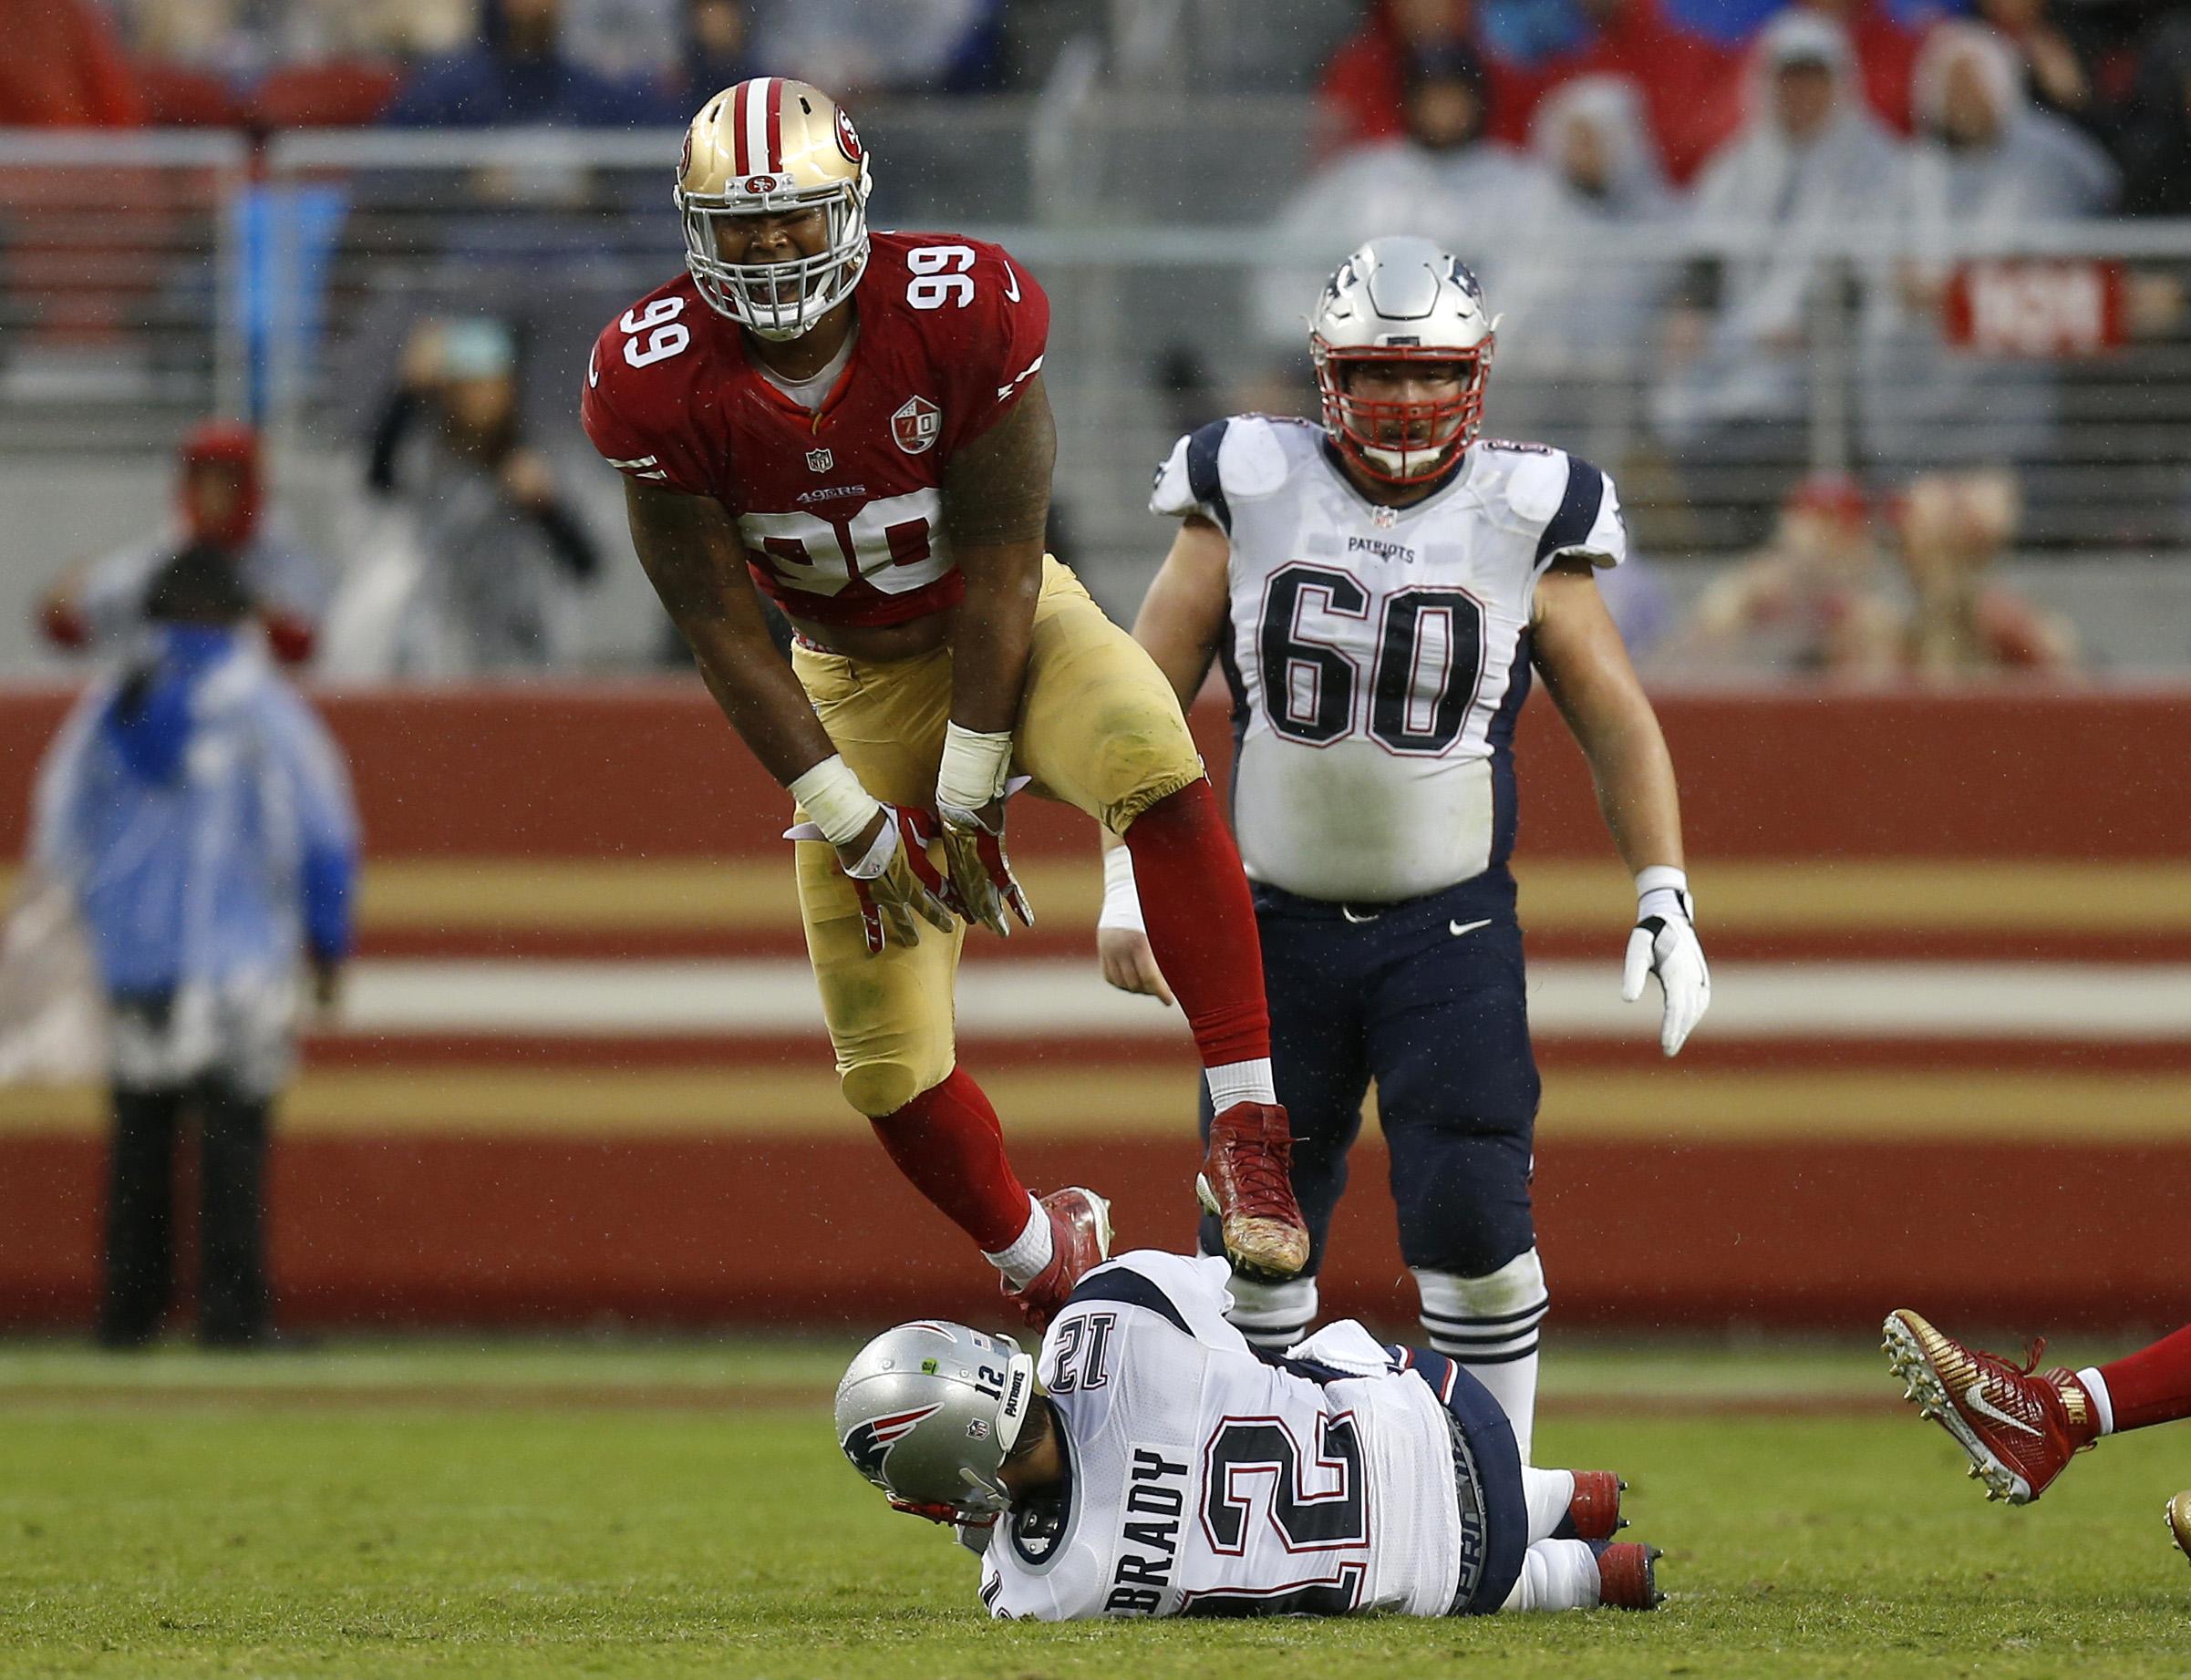 San Francisco 49ers' DeForest Buckner (99) celebrates his sack against New England Patriots starting quarterback Tom Brady (12) in the second quarter of their NFL game at Levi's Stadium in Santa Clara, Calif., on Sunday, Nov. 20, 2016. (Nhat V. Meyer/Bay